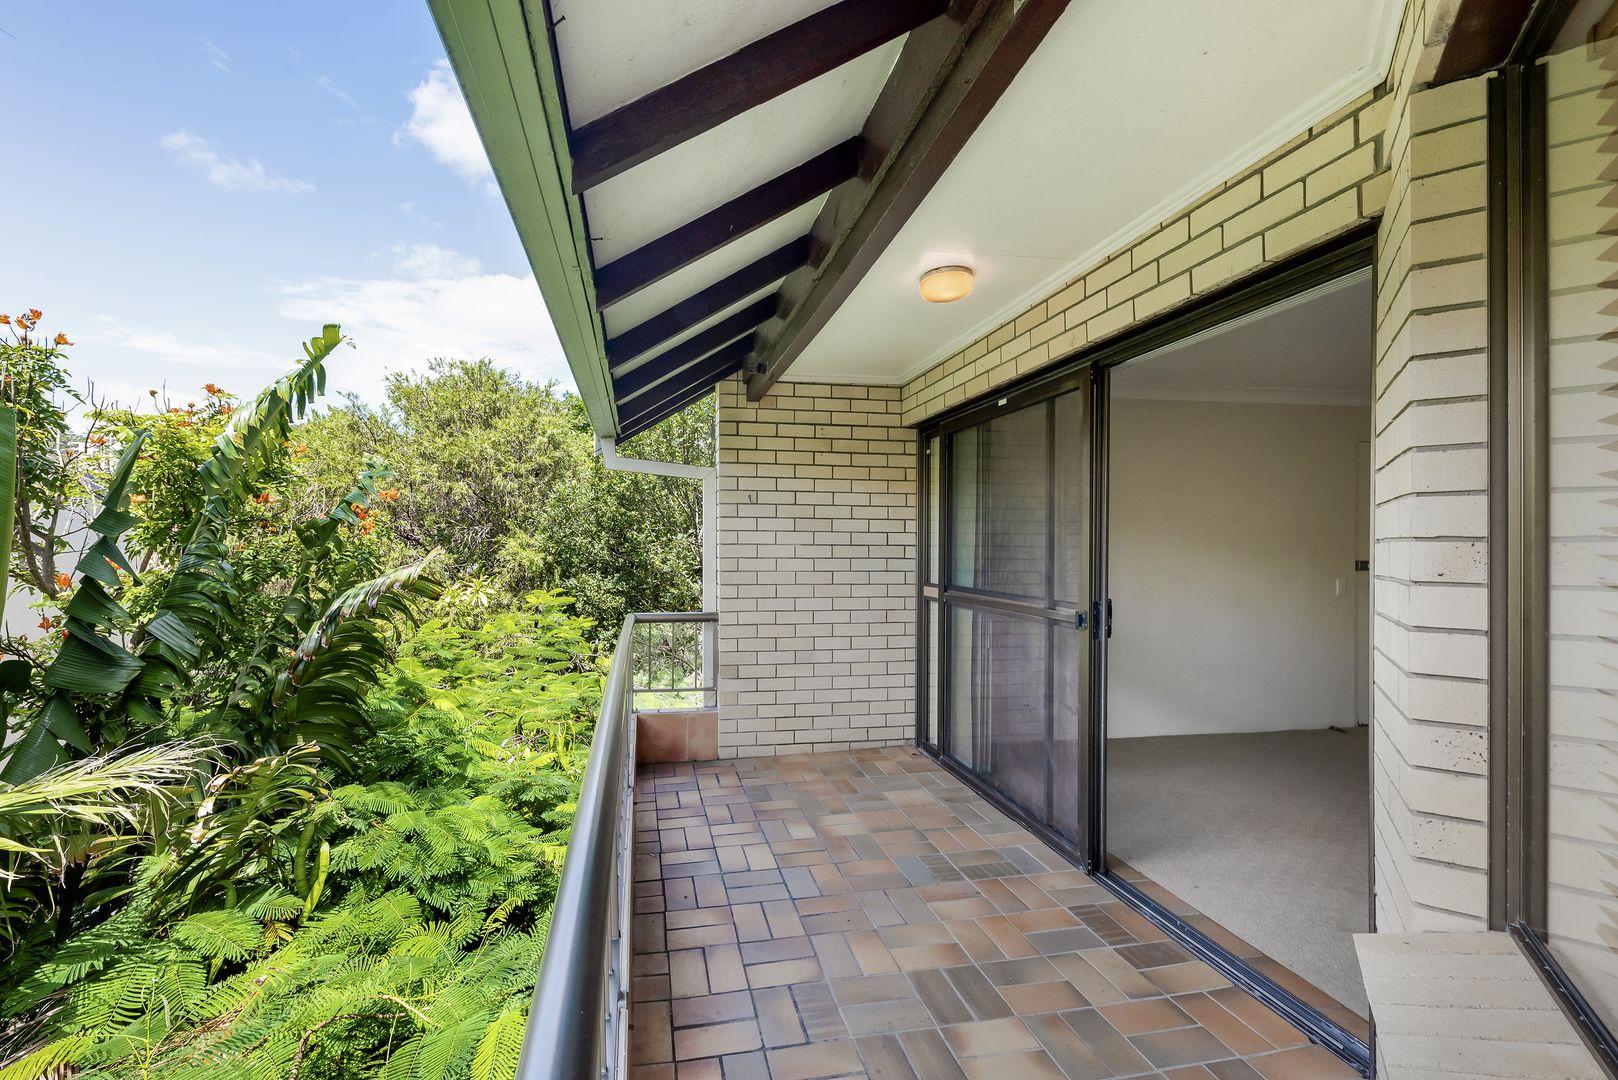 8/21 Burleigh Street, Burleigh Heads QLD 4220, Image 0